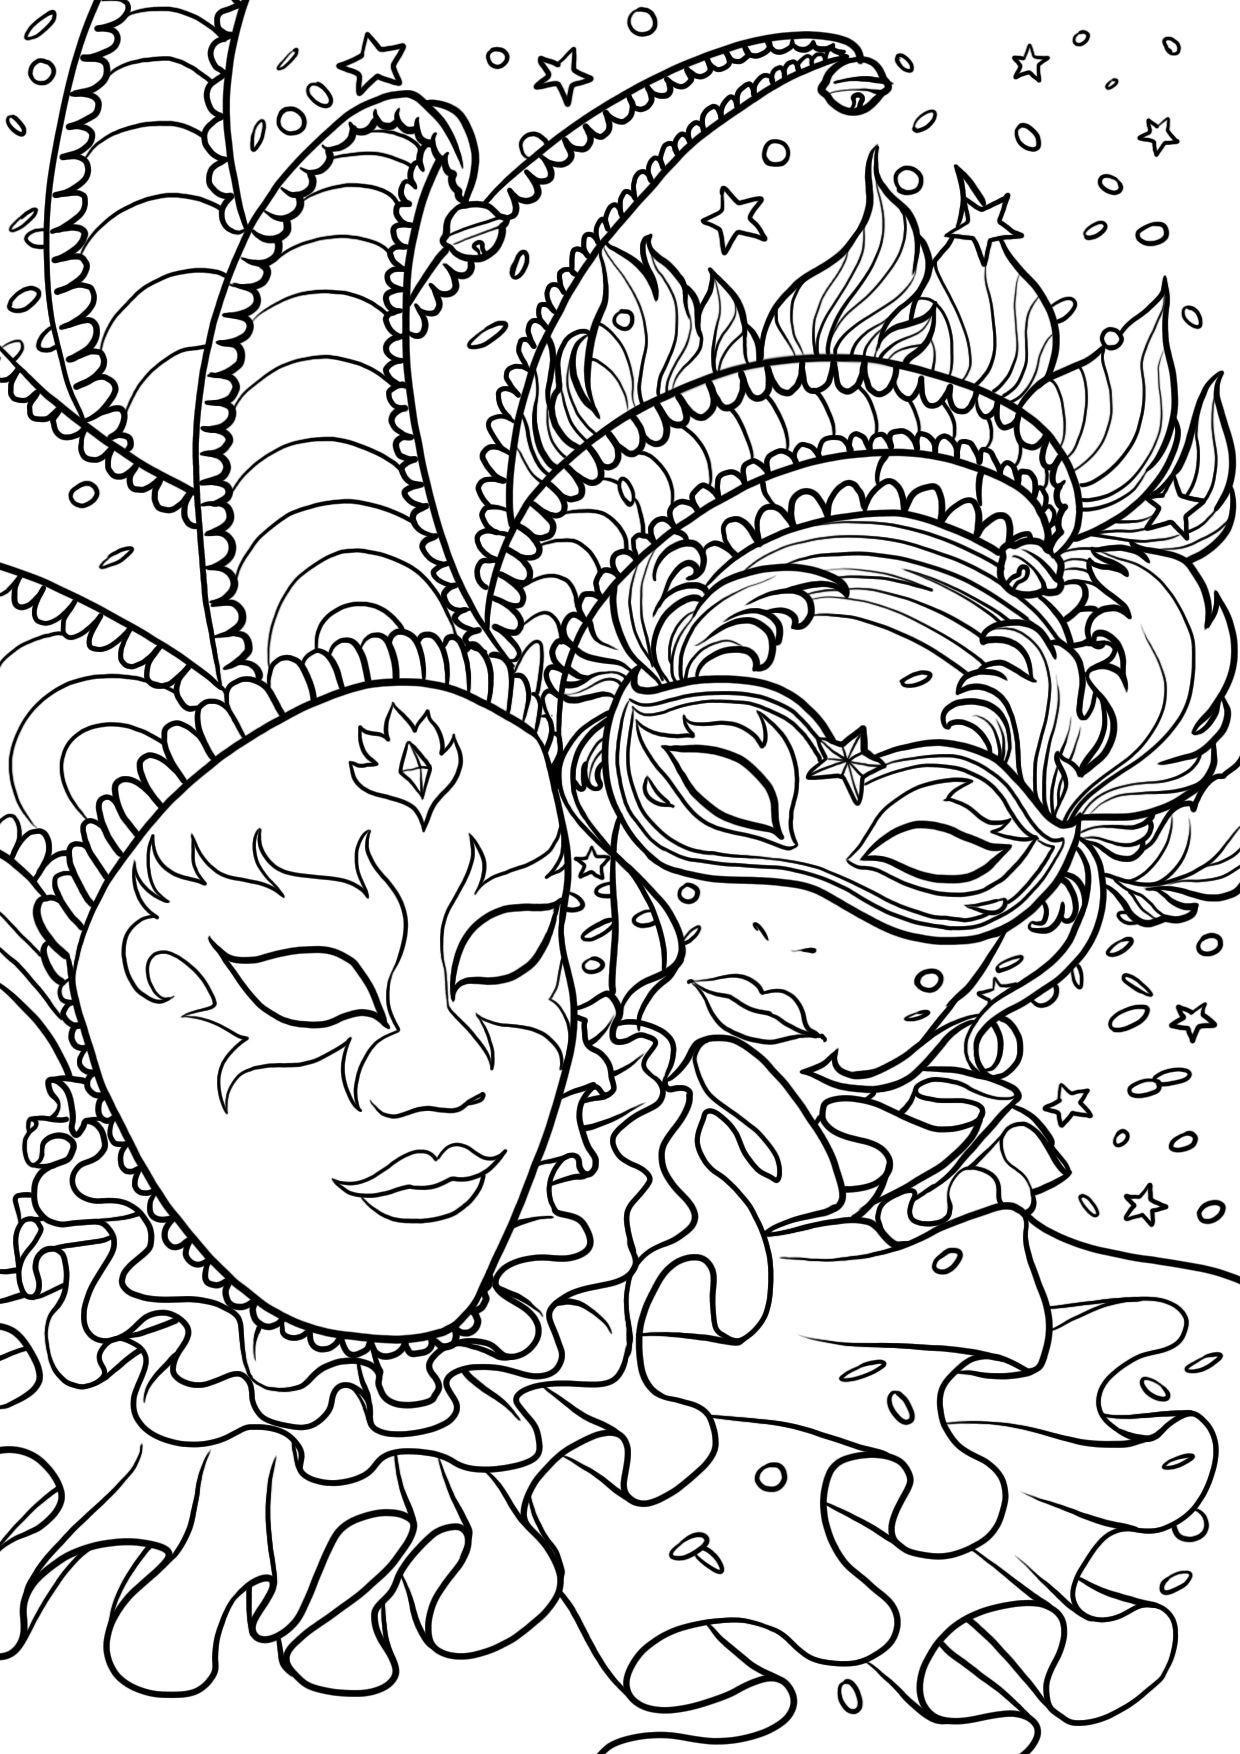 Coloriage Carnaval | Coloriage Carnaval, Coloriage, Dessin concernant Coloriage A Imprimer Gratuit